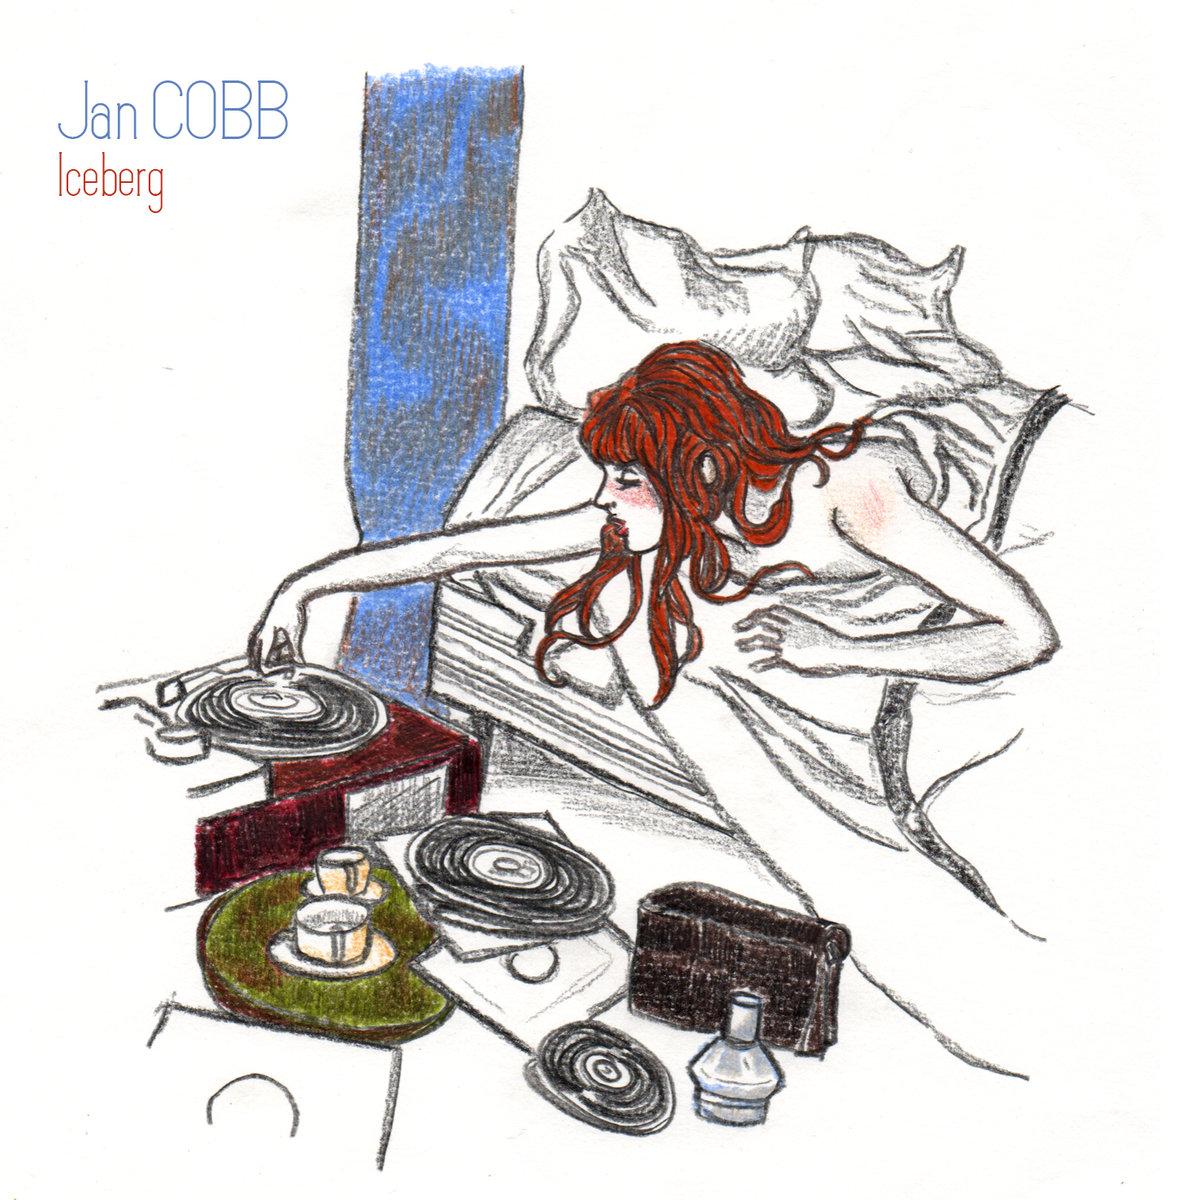 Jan Cobb - Iceberg